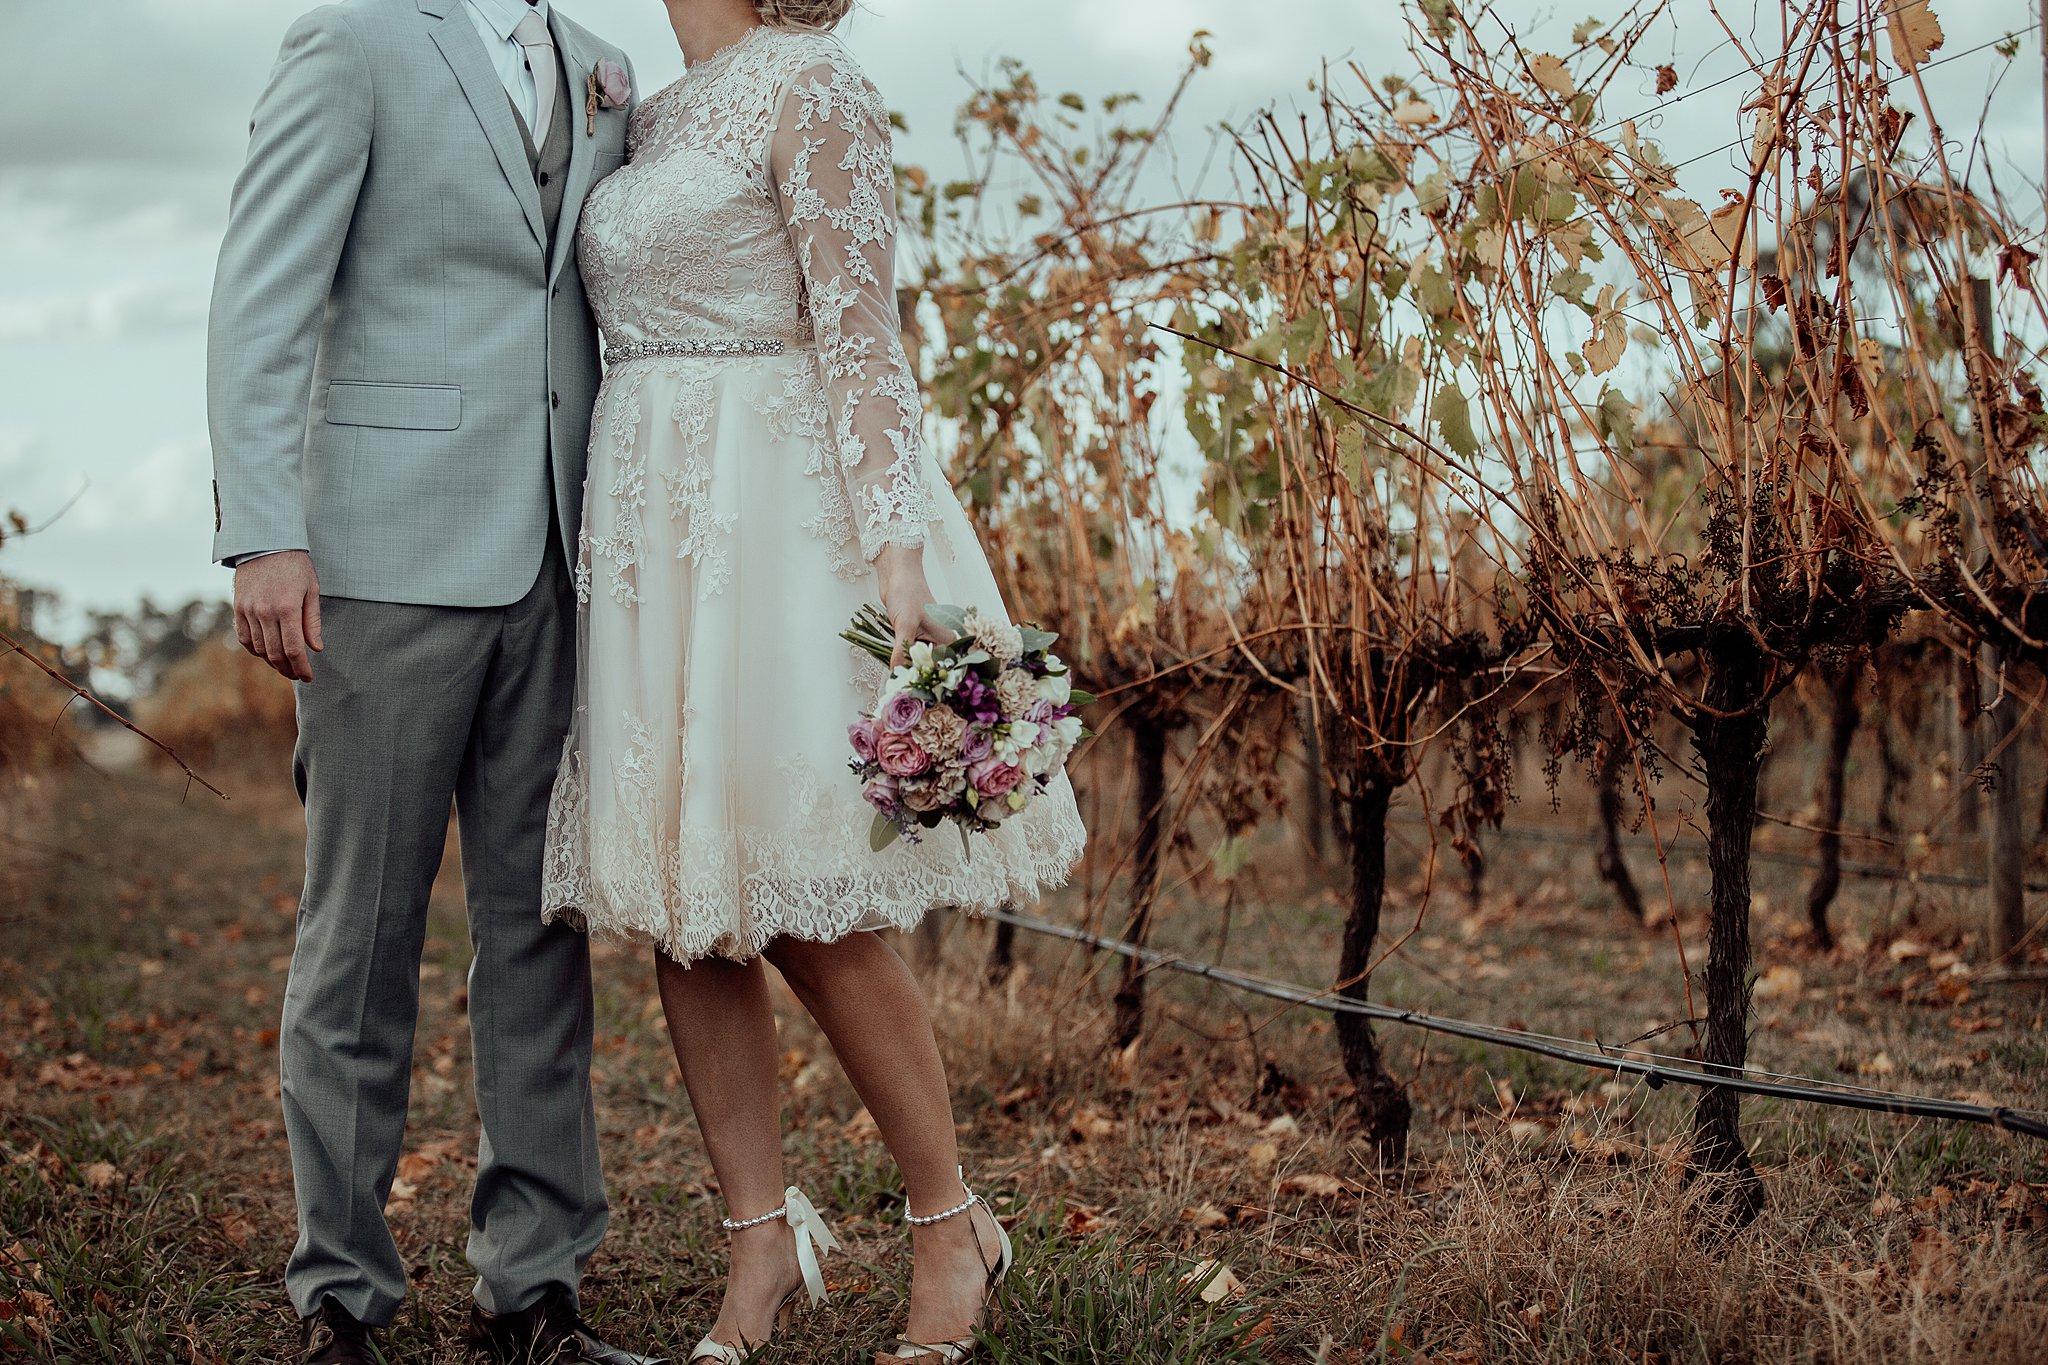 mickalathomas_puremacphotography_weddingphotographer_couplephotographer_Sheppartonphotographer_3457.jpg